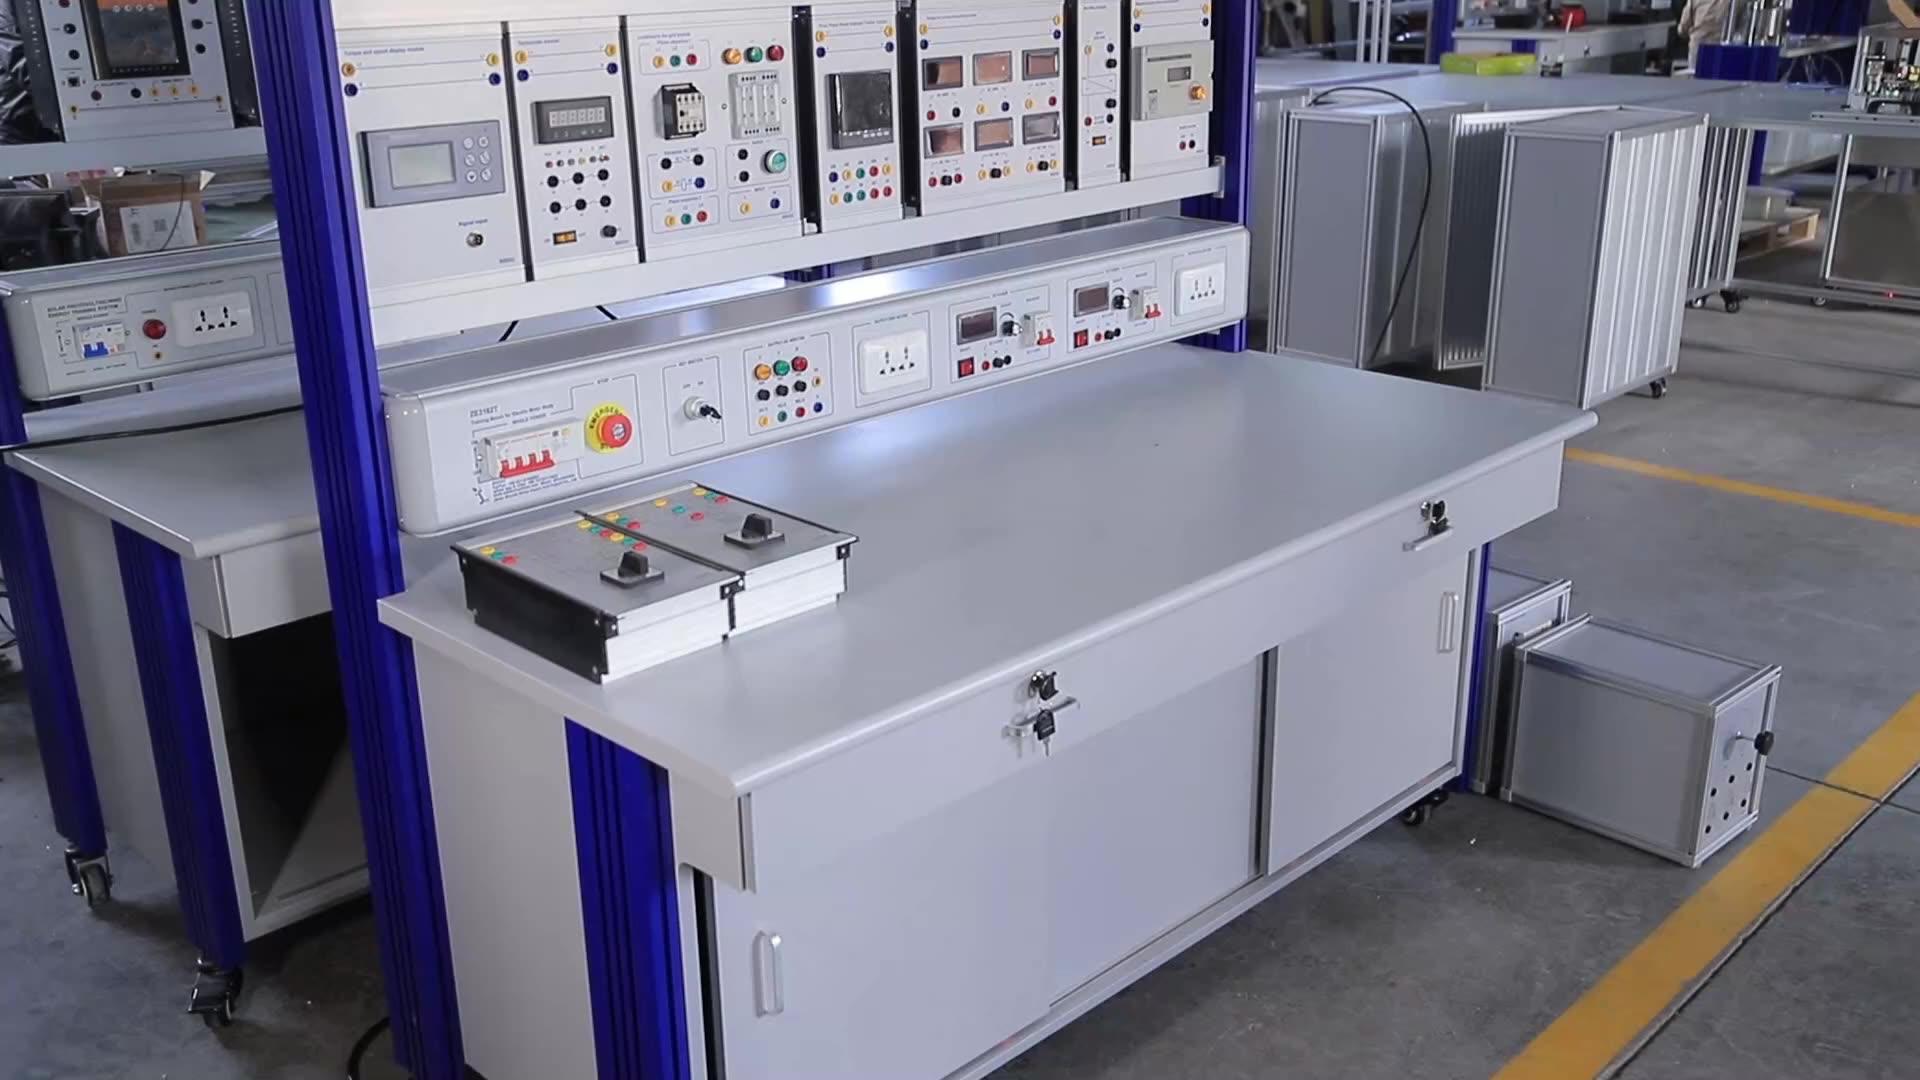 PLC Trainer Kit with simulators Electrical Educational Equipment Classroom Training Set